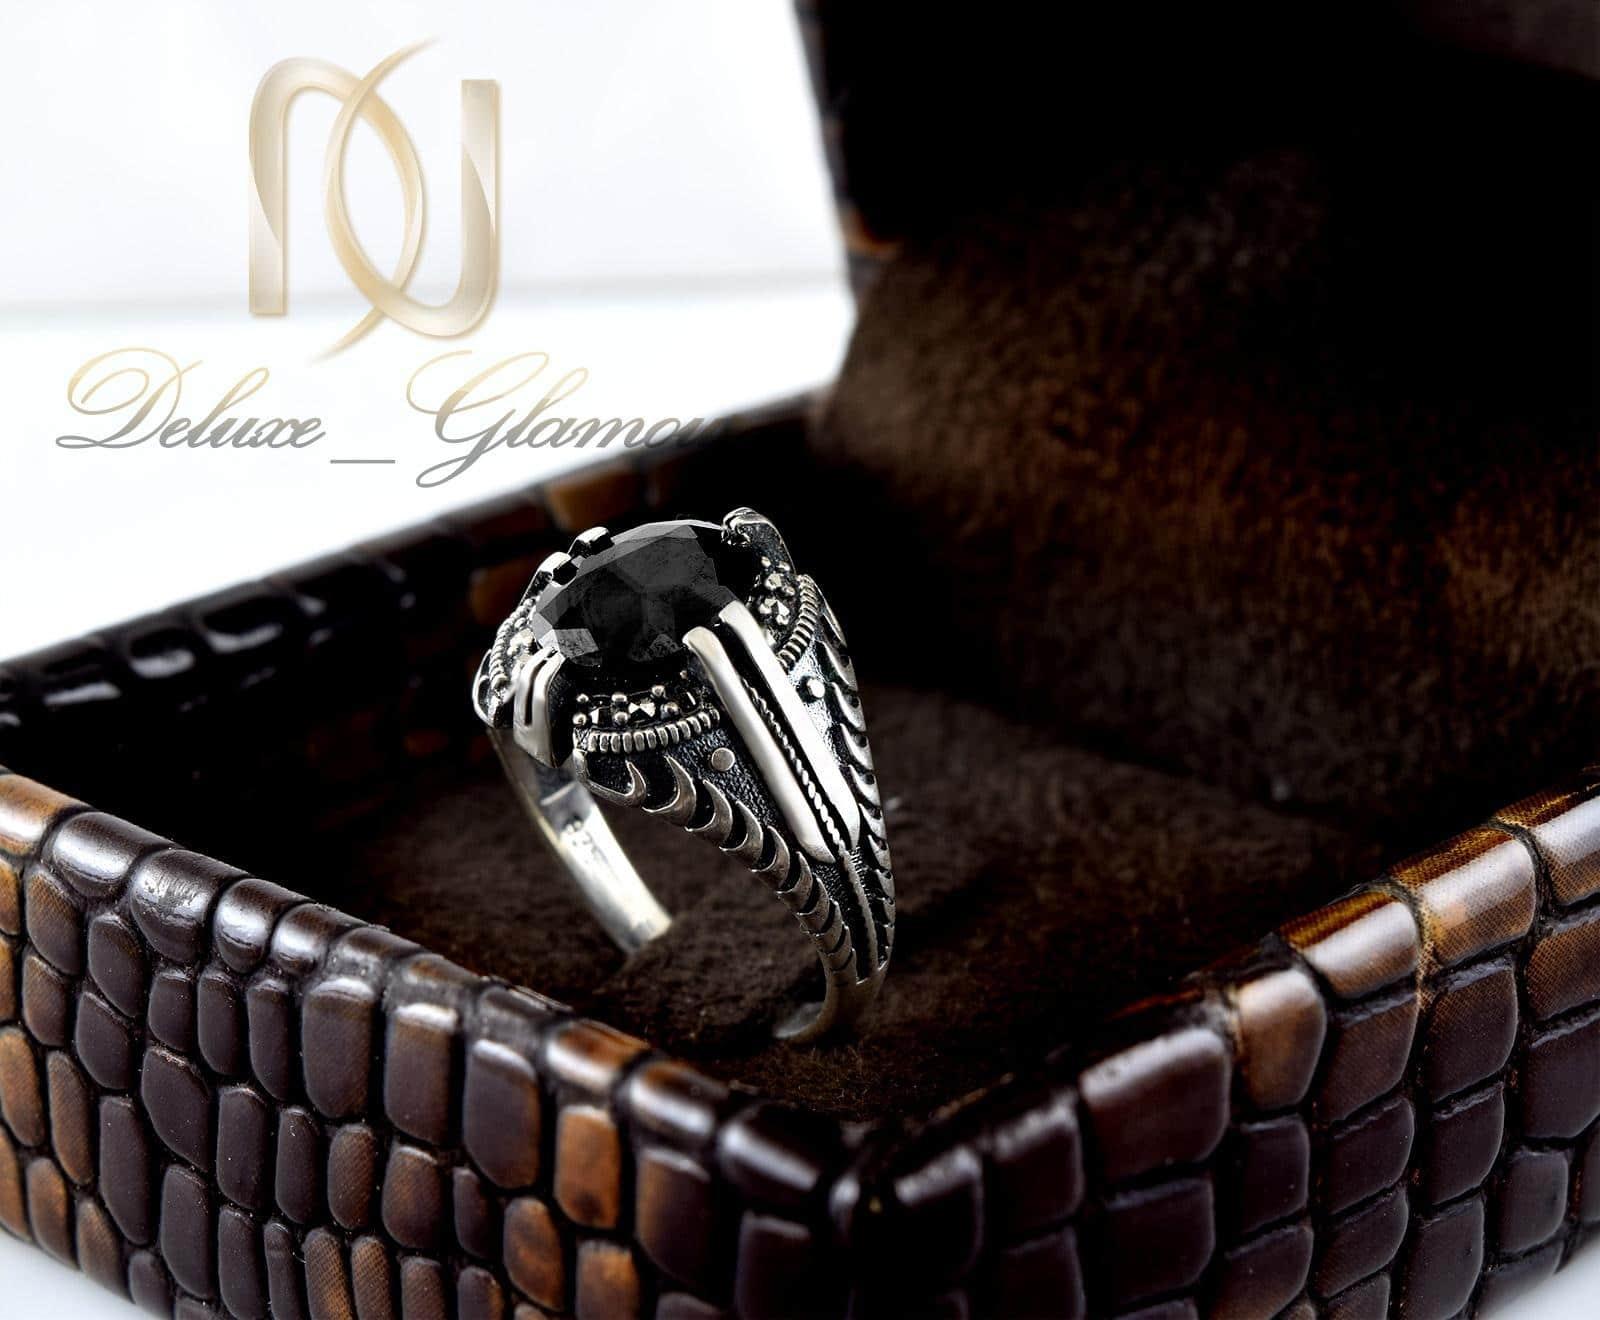 انگشتر نقره مردانه با نگين عقيق مشكي rg-n315 از نماي روبرو